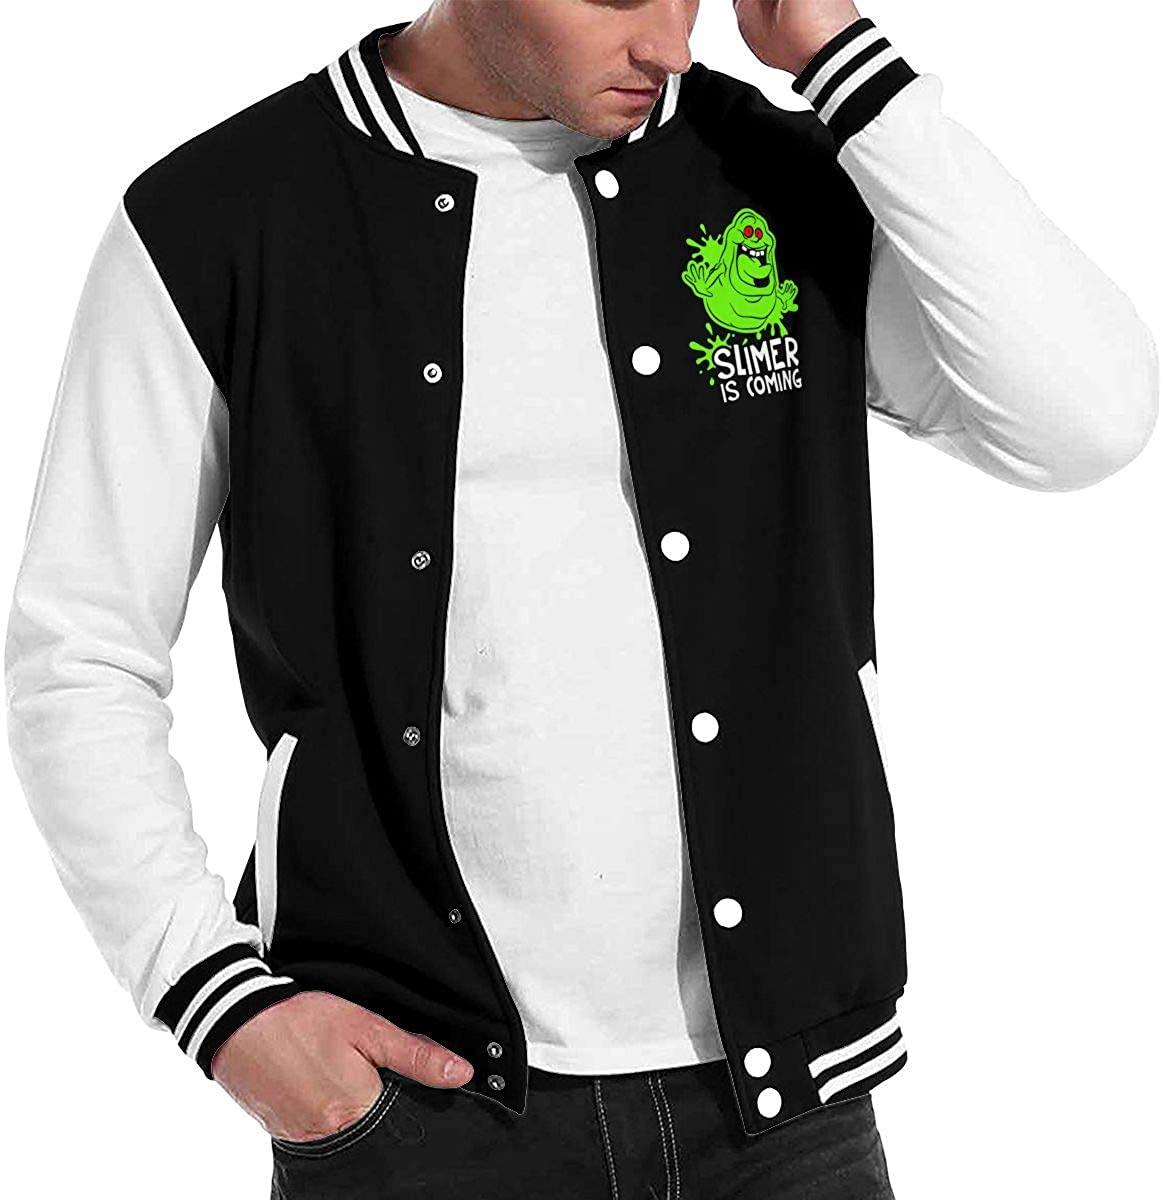 1836 Ghostbusters Slimer is Coming Unisex Baseball Jacket Varsity Jacket